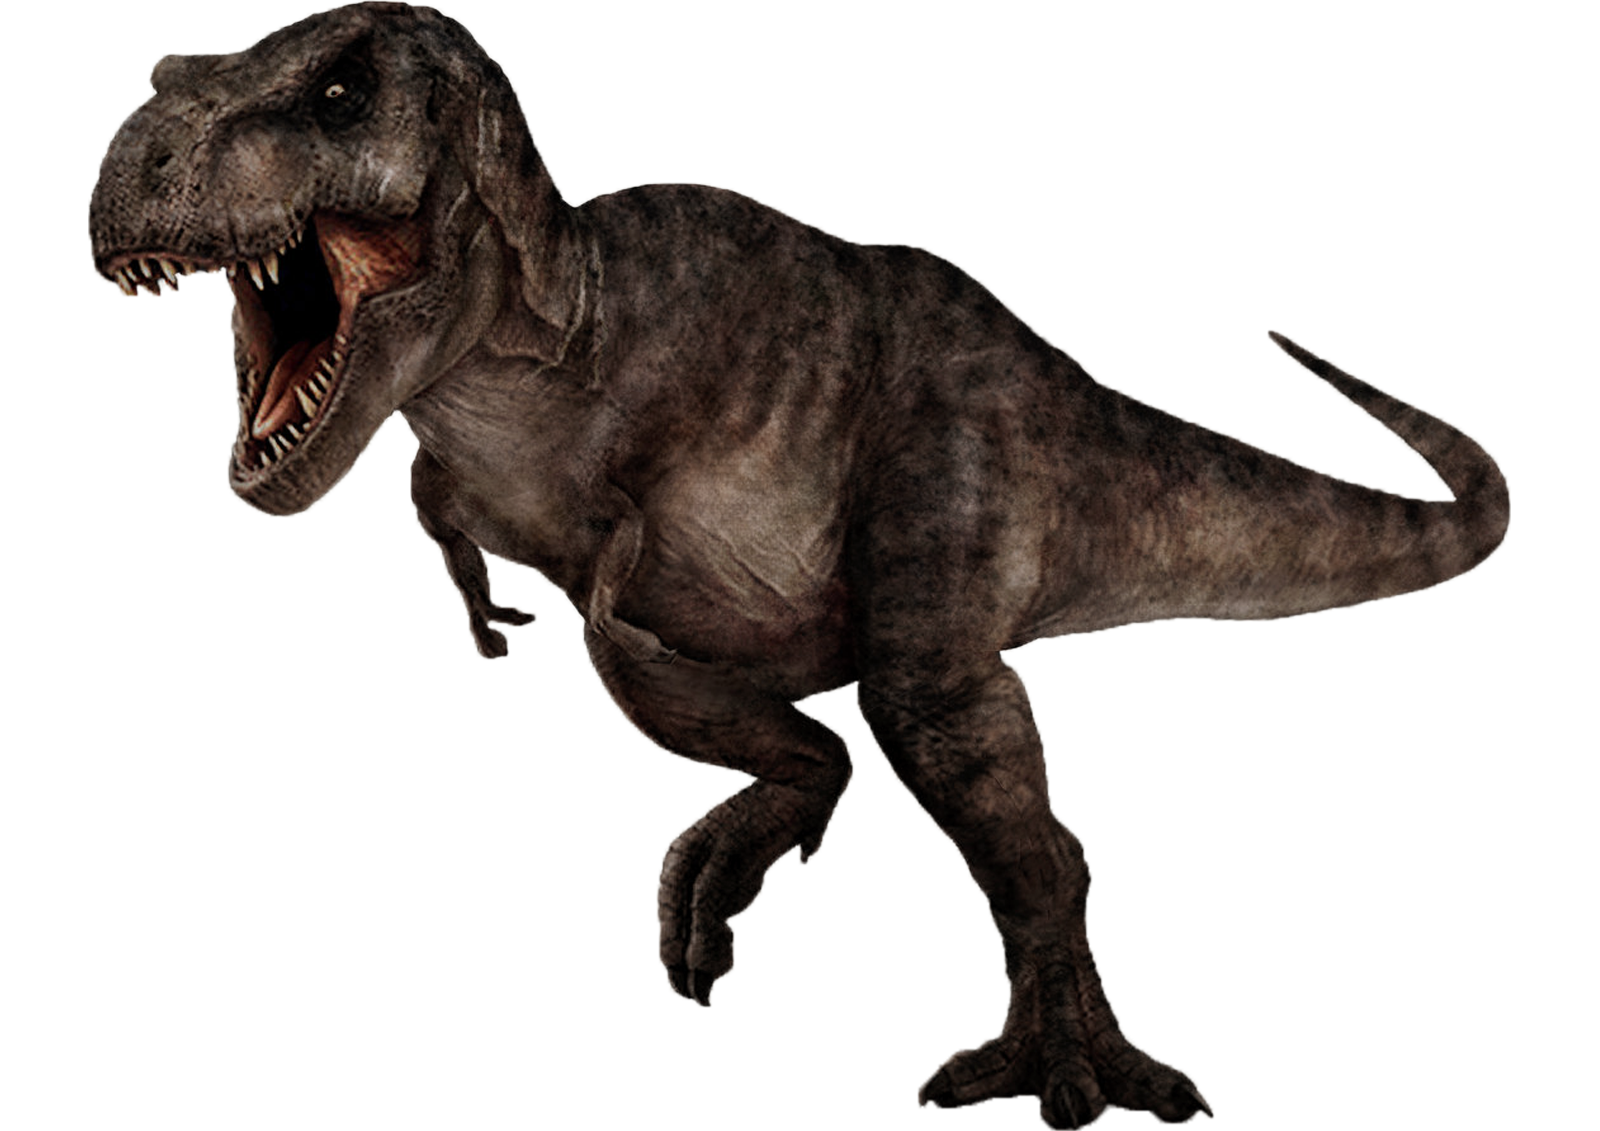 Tyrannosaurus rex 2 by darbarrrr - T Rex PNG HD